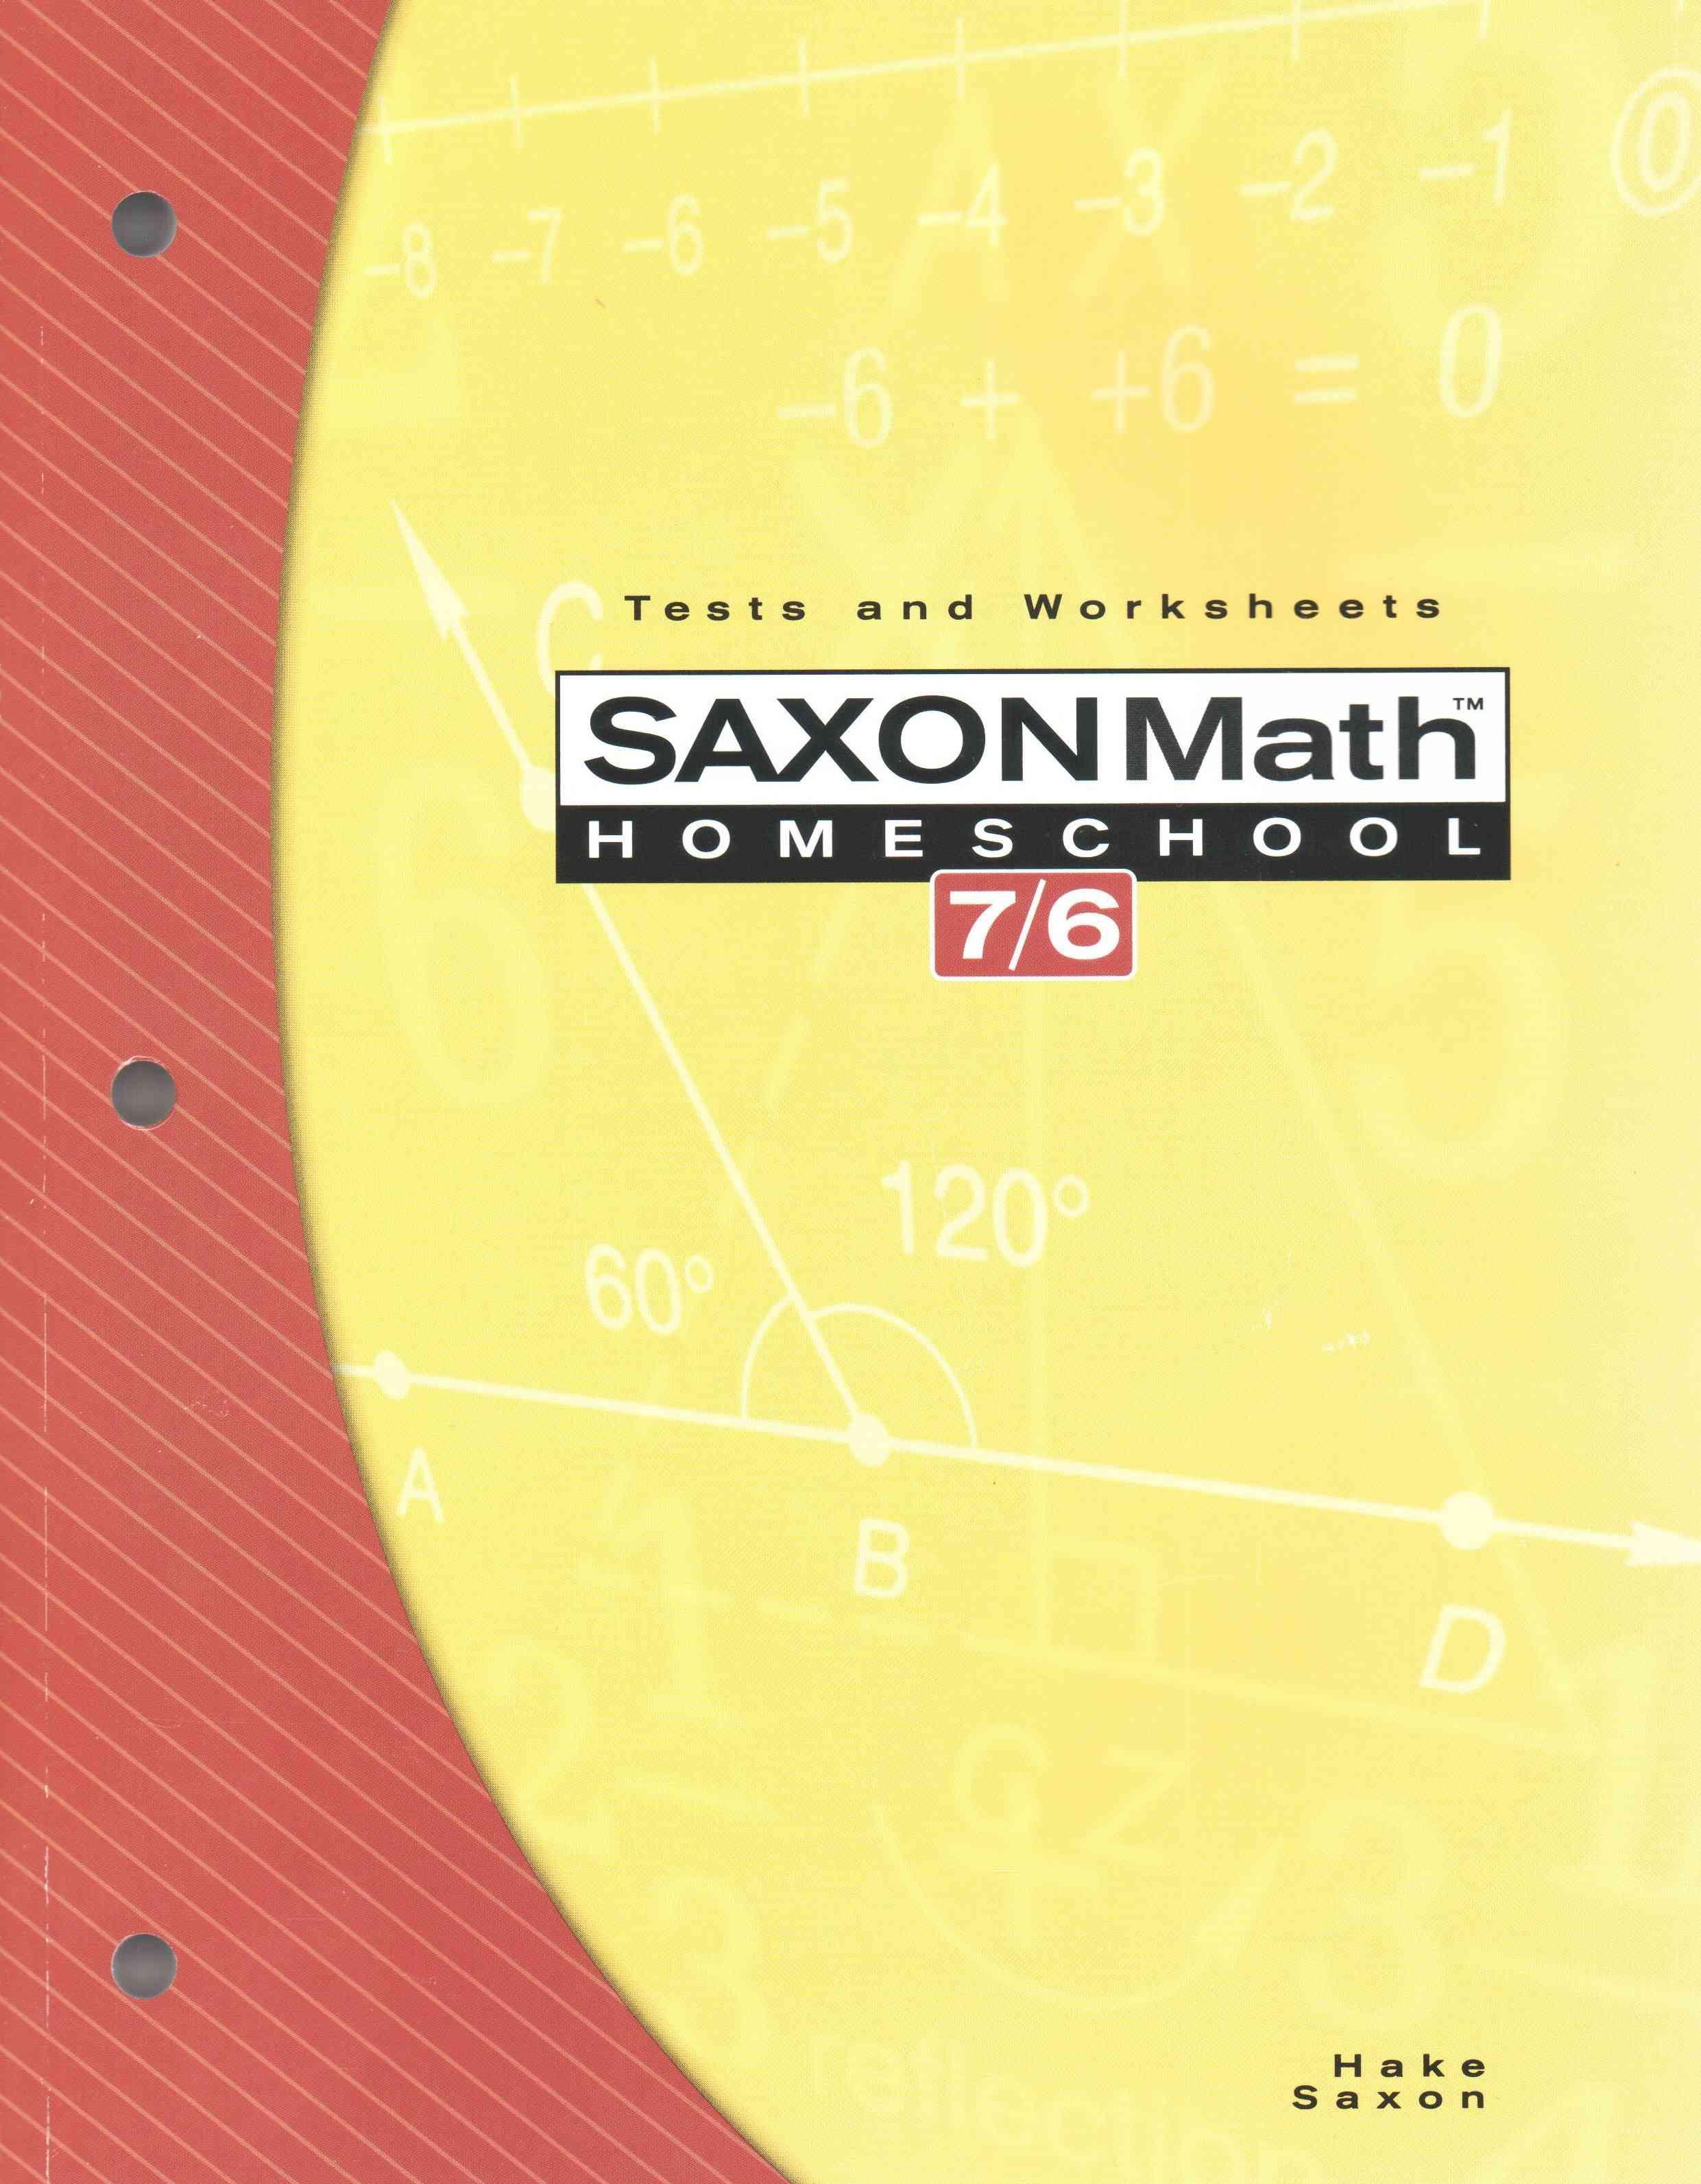 Saxon Math 7 6 Homeschool Tests And Worksheets